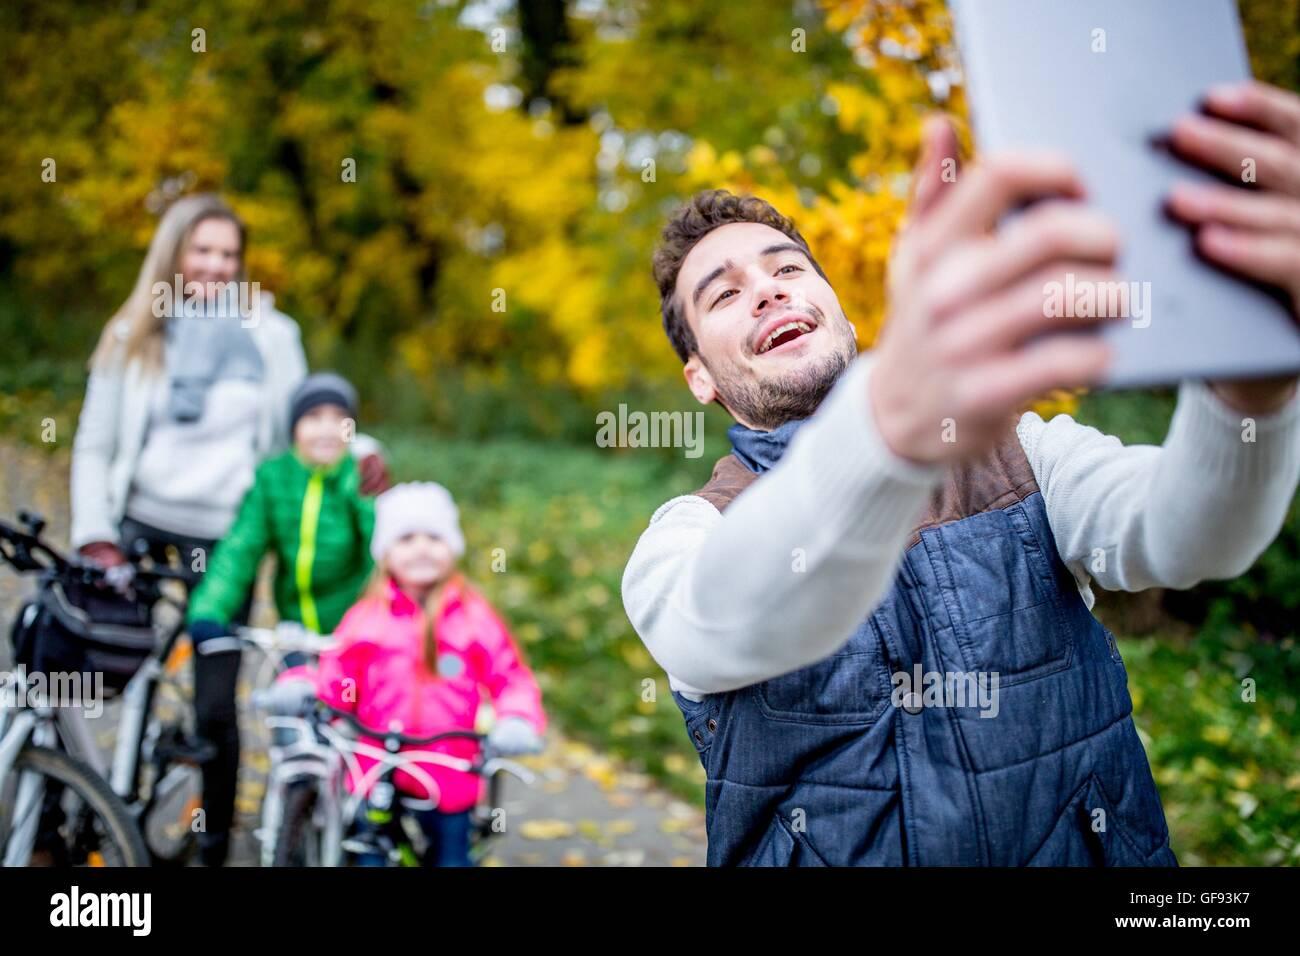 Modelo liberado. Hombre sonriente tomando foto de familia. Imagen De Stock